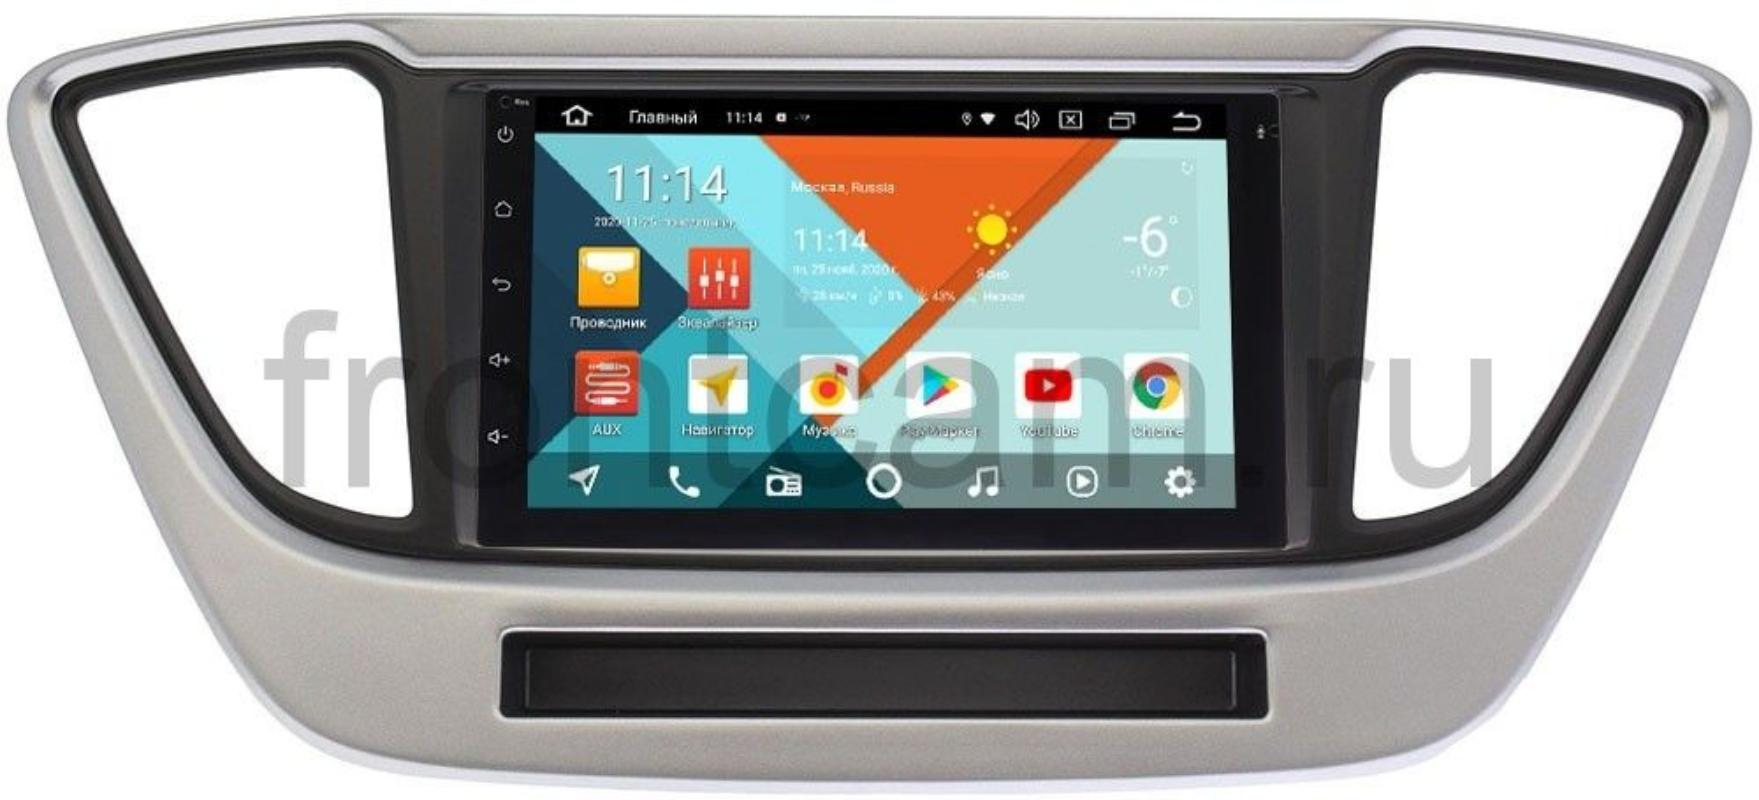 Штатная магнитола Hyundai Solaris II Wide Media KS7001QR-3/32-RP-HDLSLc-33 на Android 10 (DSP CarPlay 4G-SIM) (+ Камера заднего вида в подарок!)